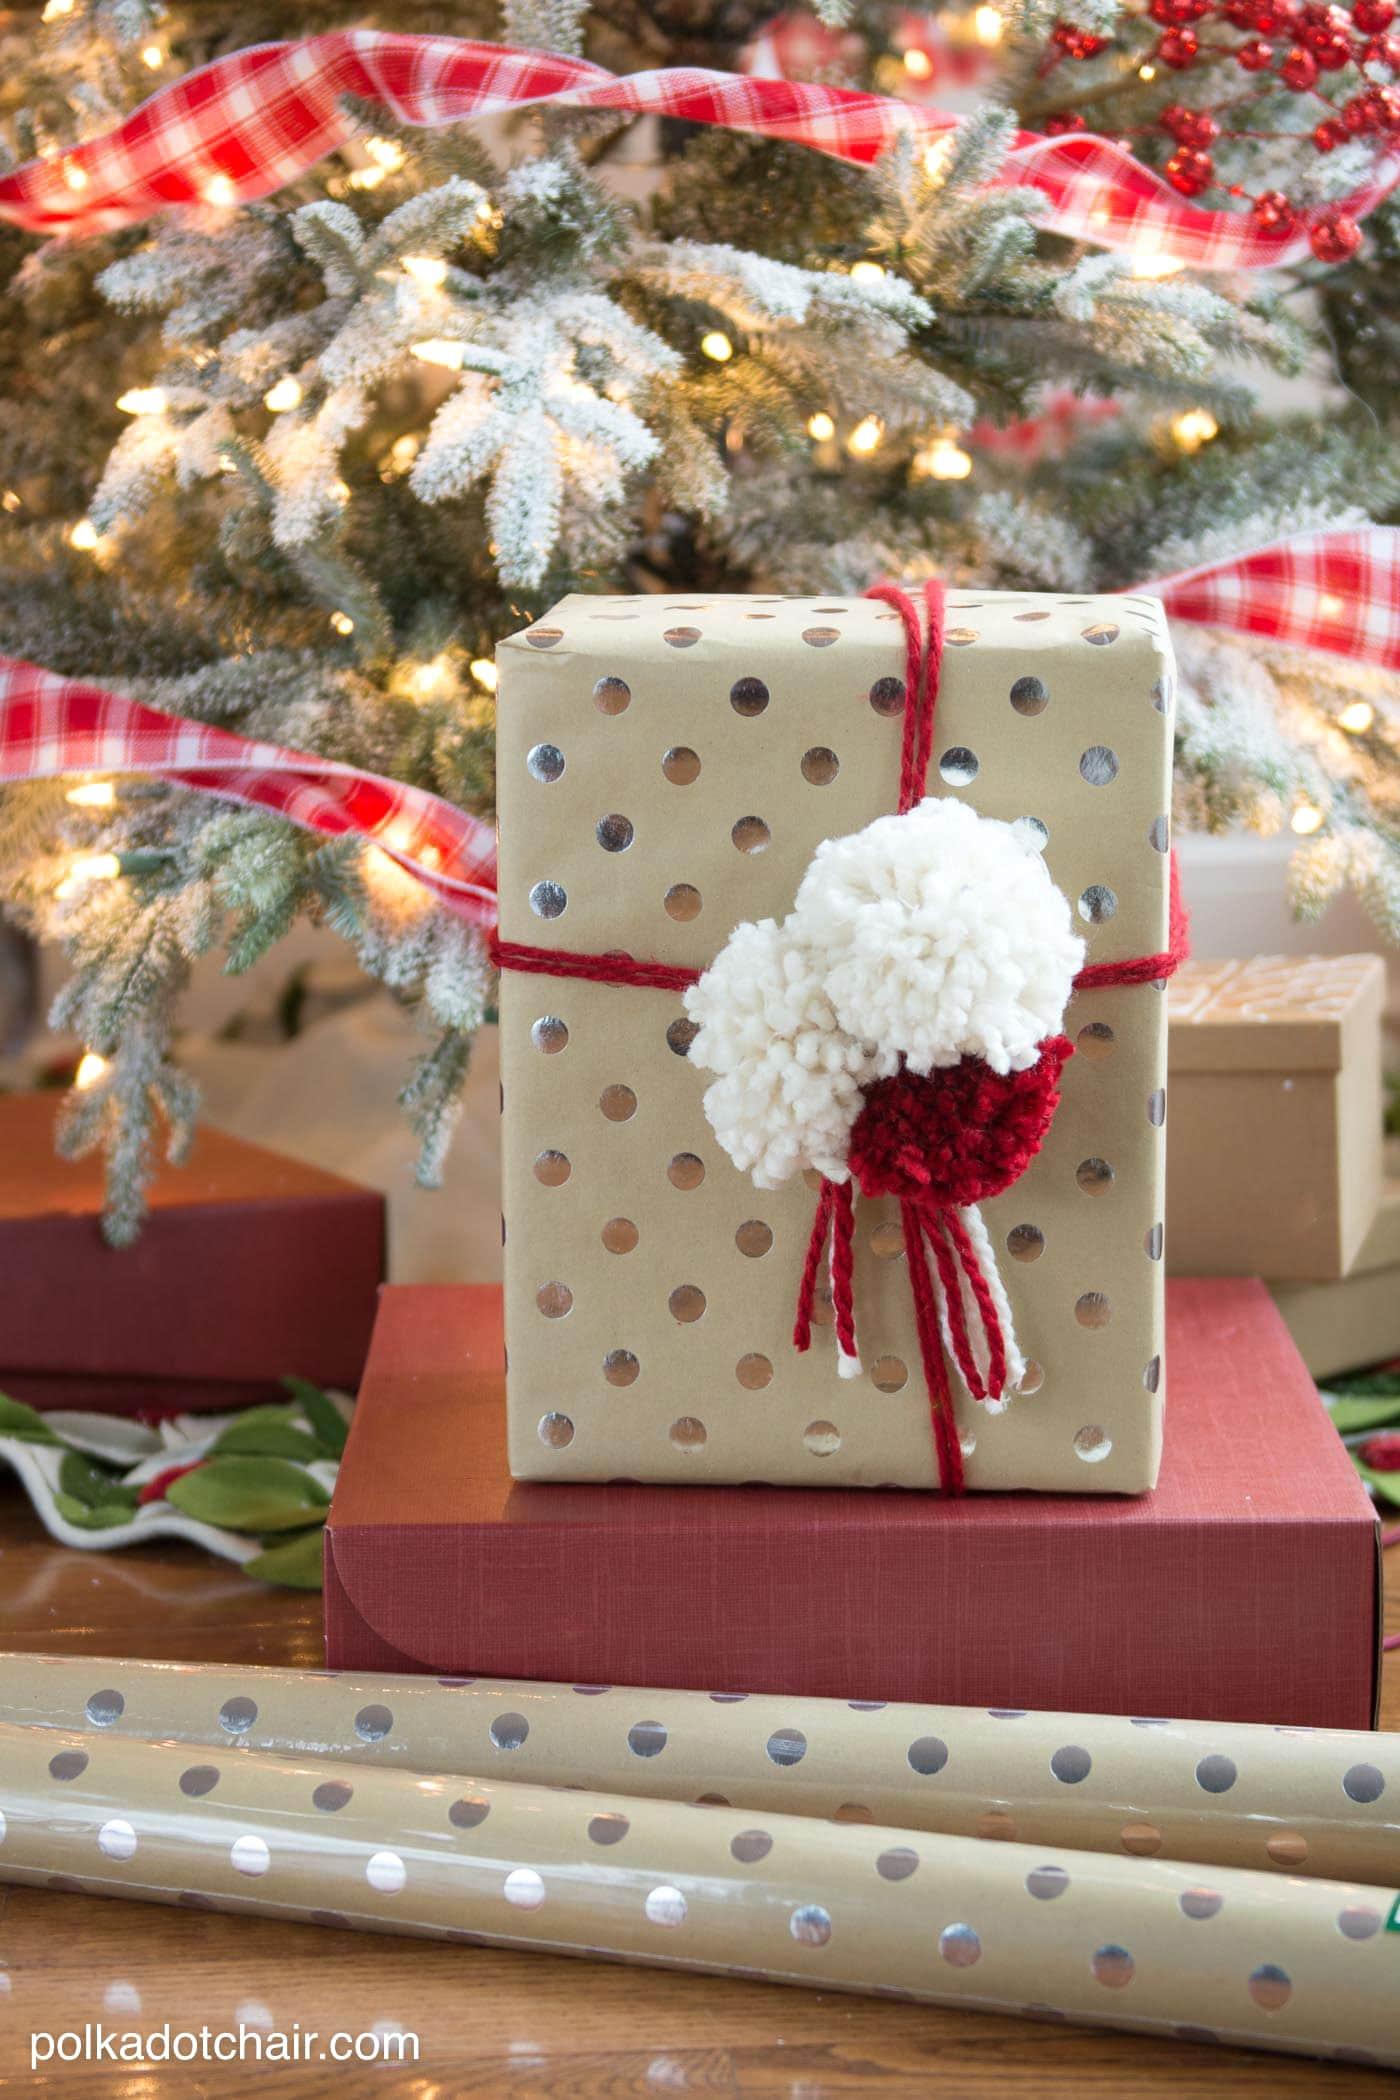 3 Simple And Creative Gift Wrap Ideas The Polka Dot Chair